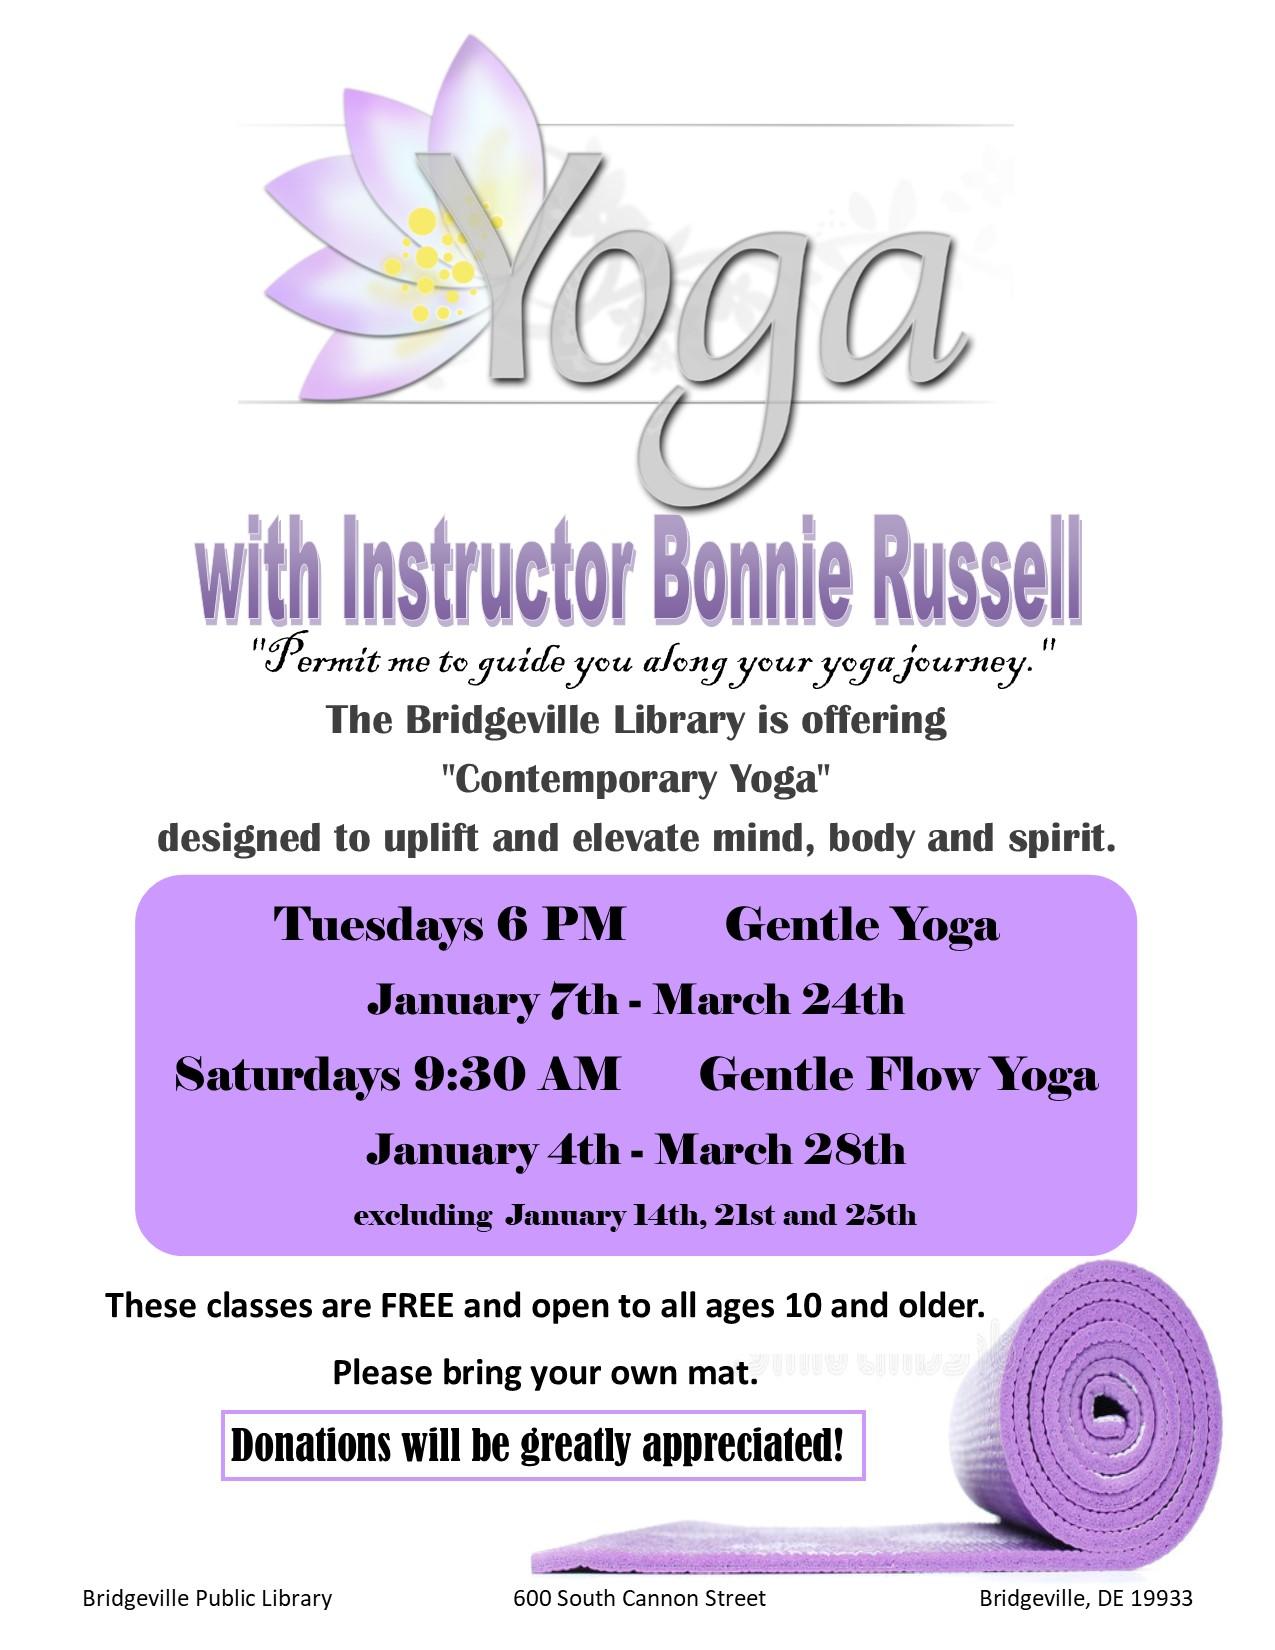 Gentle Flow Yoga with Bonnie